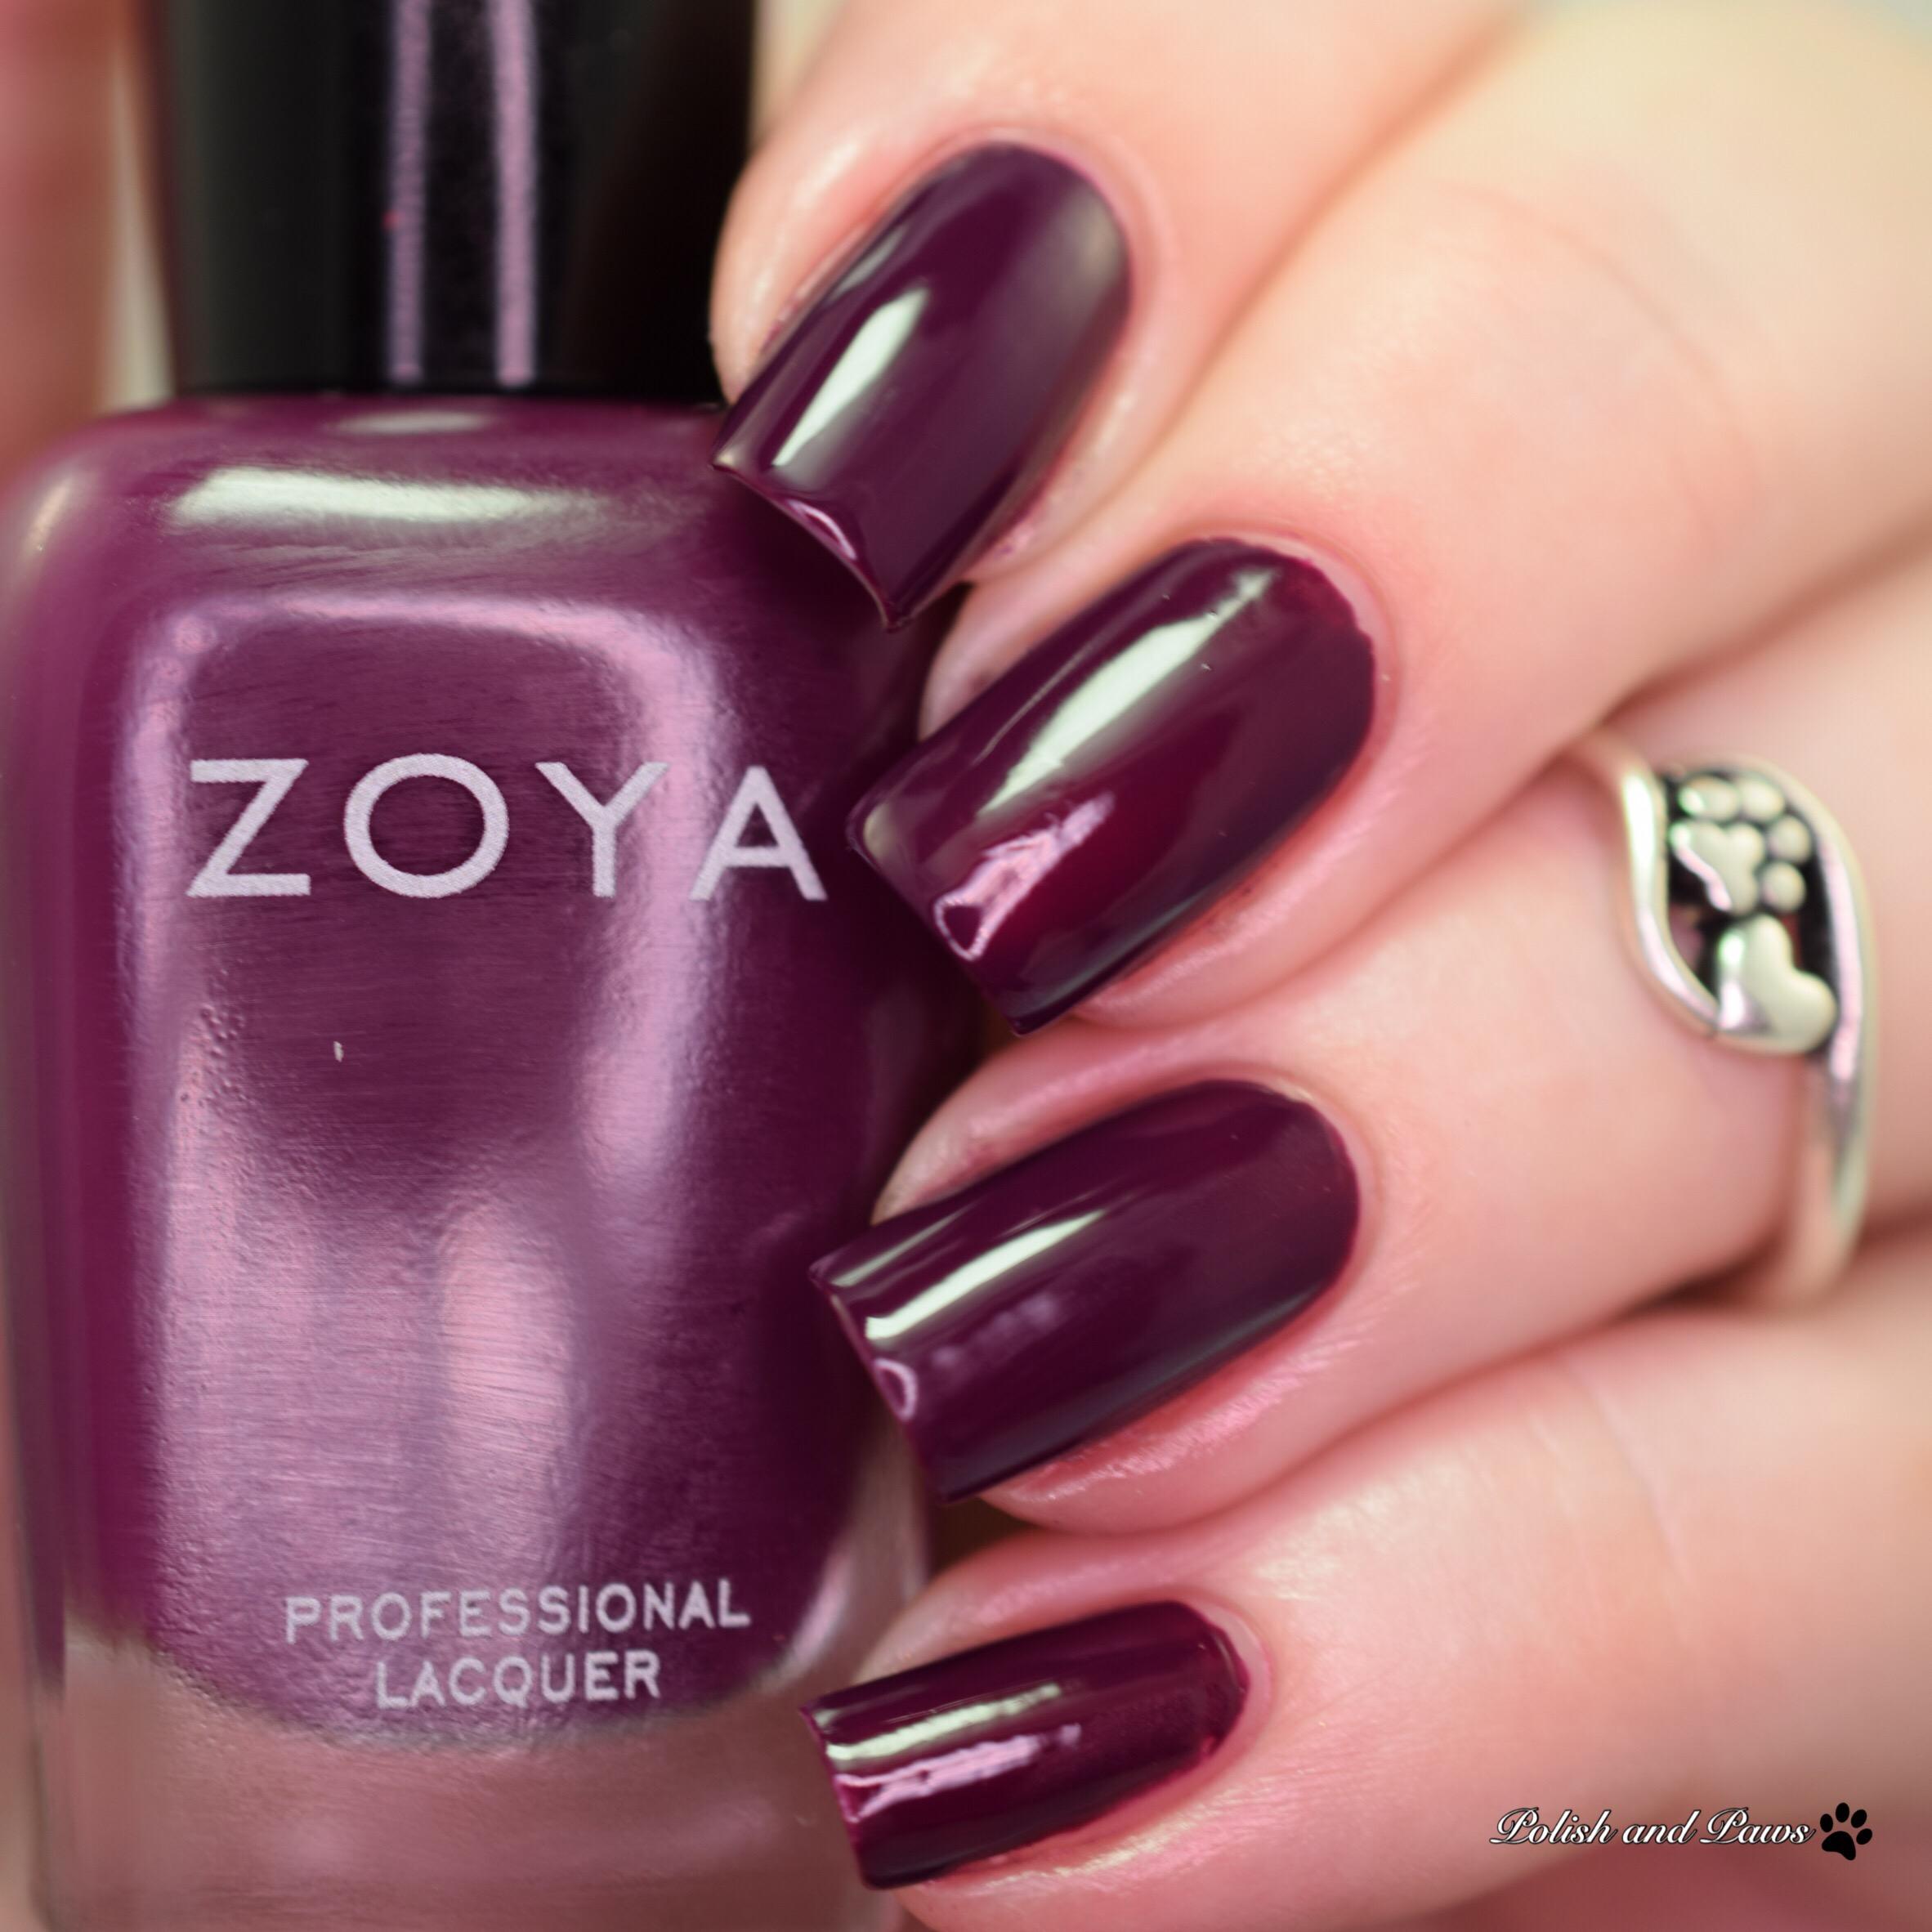 Zoya Tara